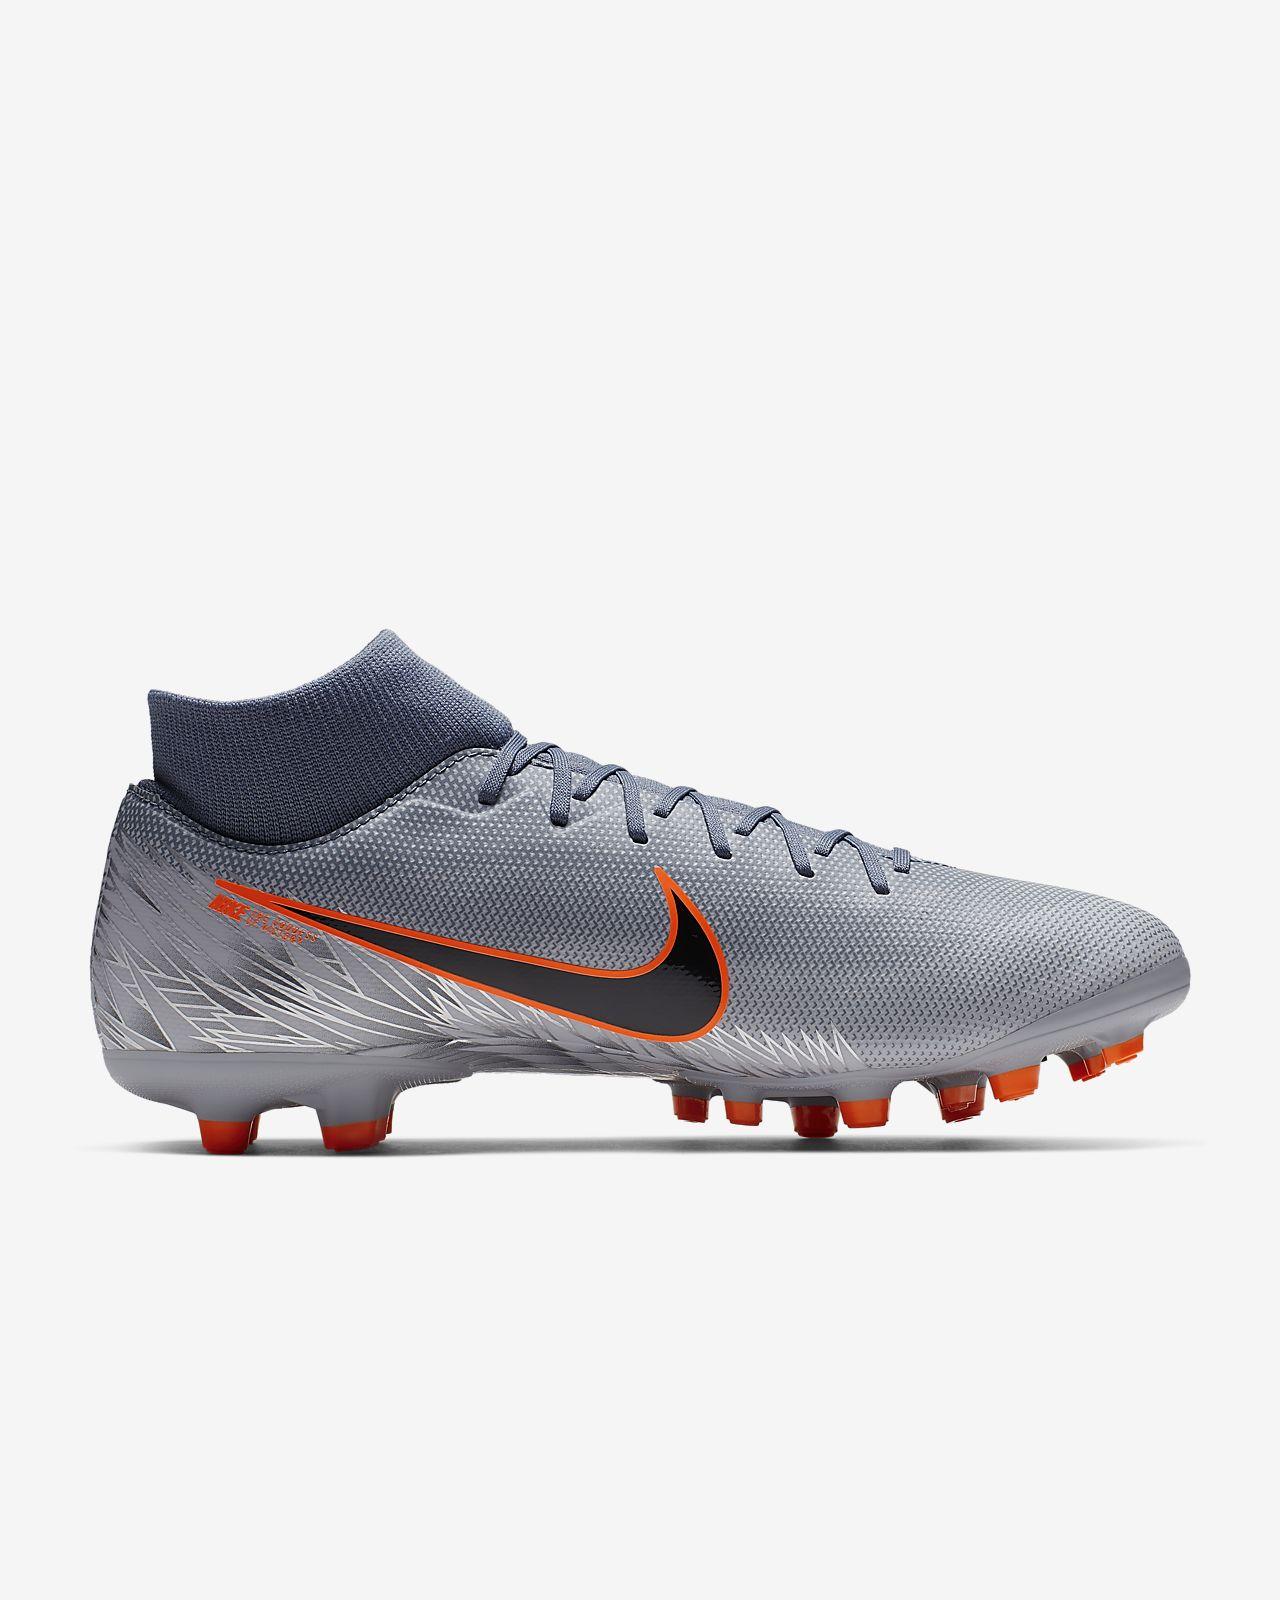 a8a81604f ... Nike Mercurial Superfly 6 Academy MG Botas de fútbol para múltiples  superficies